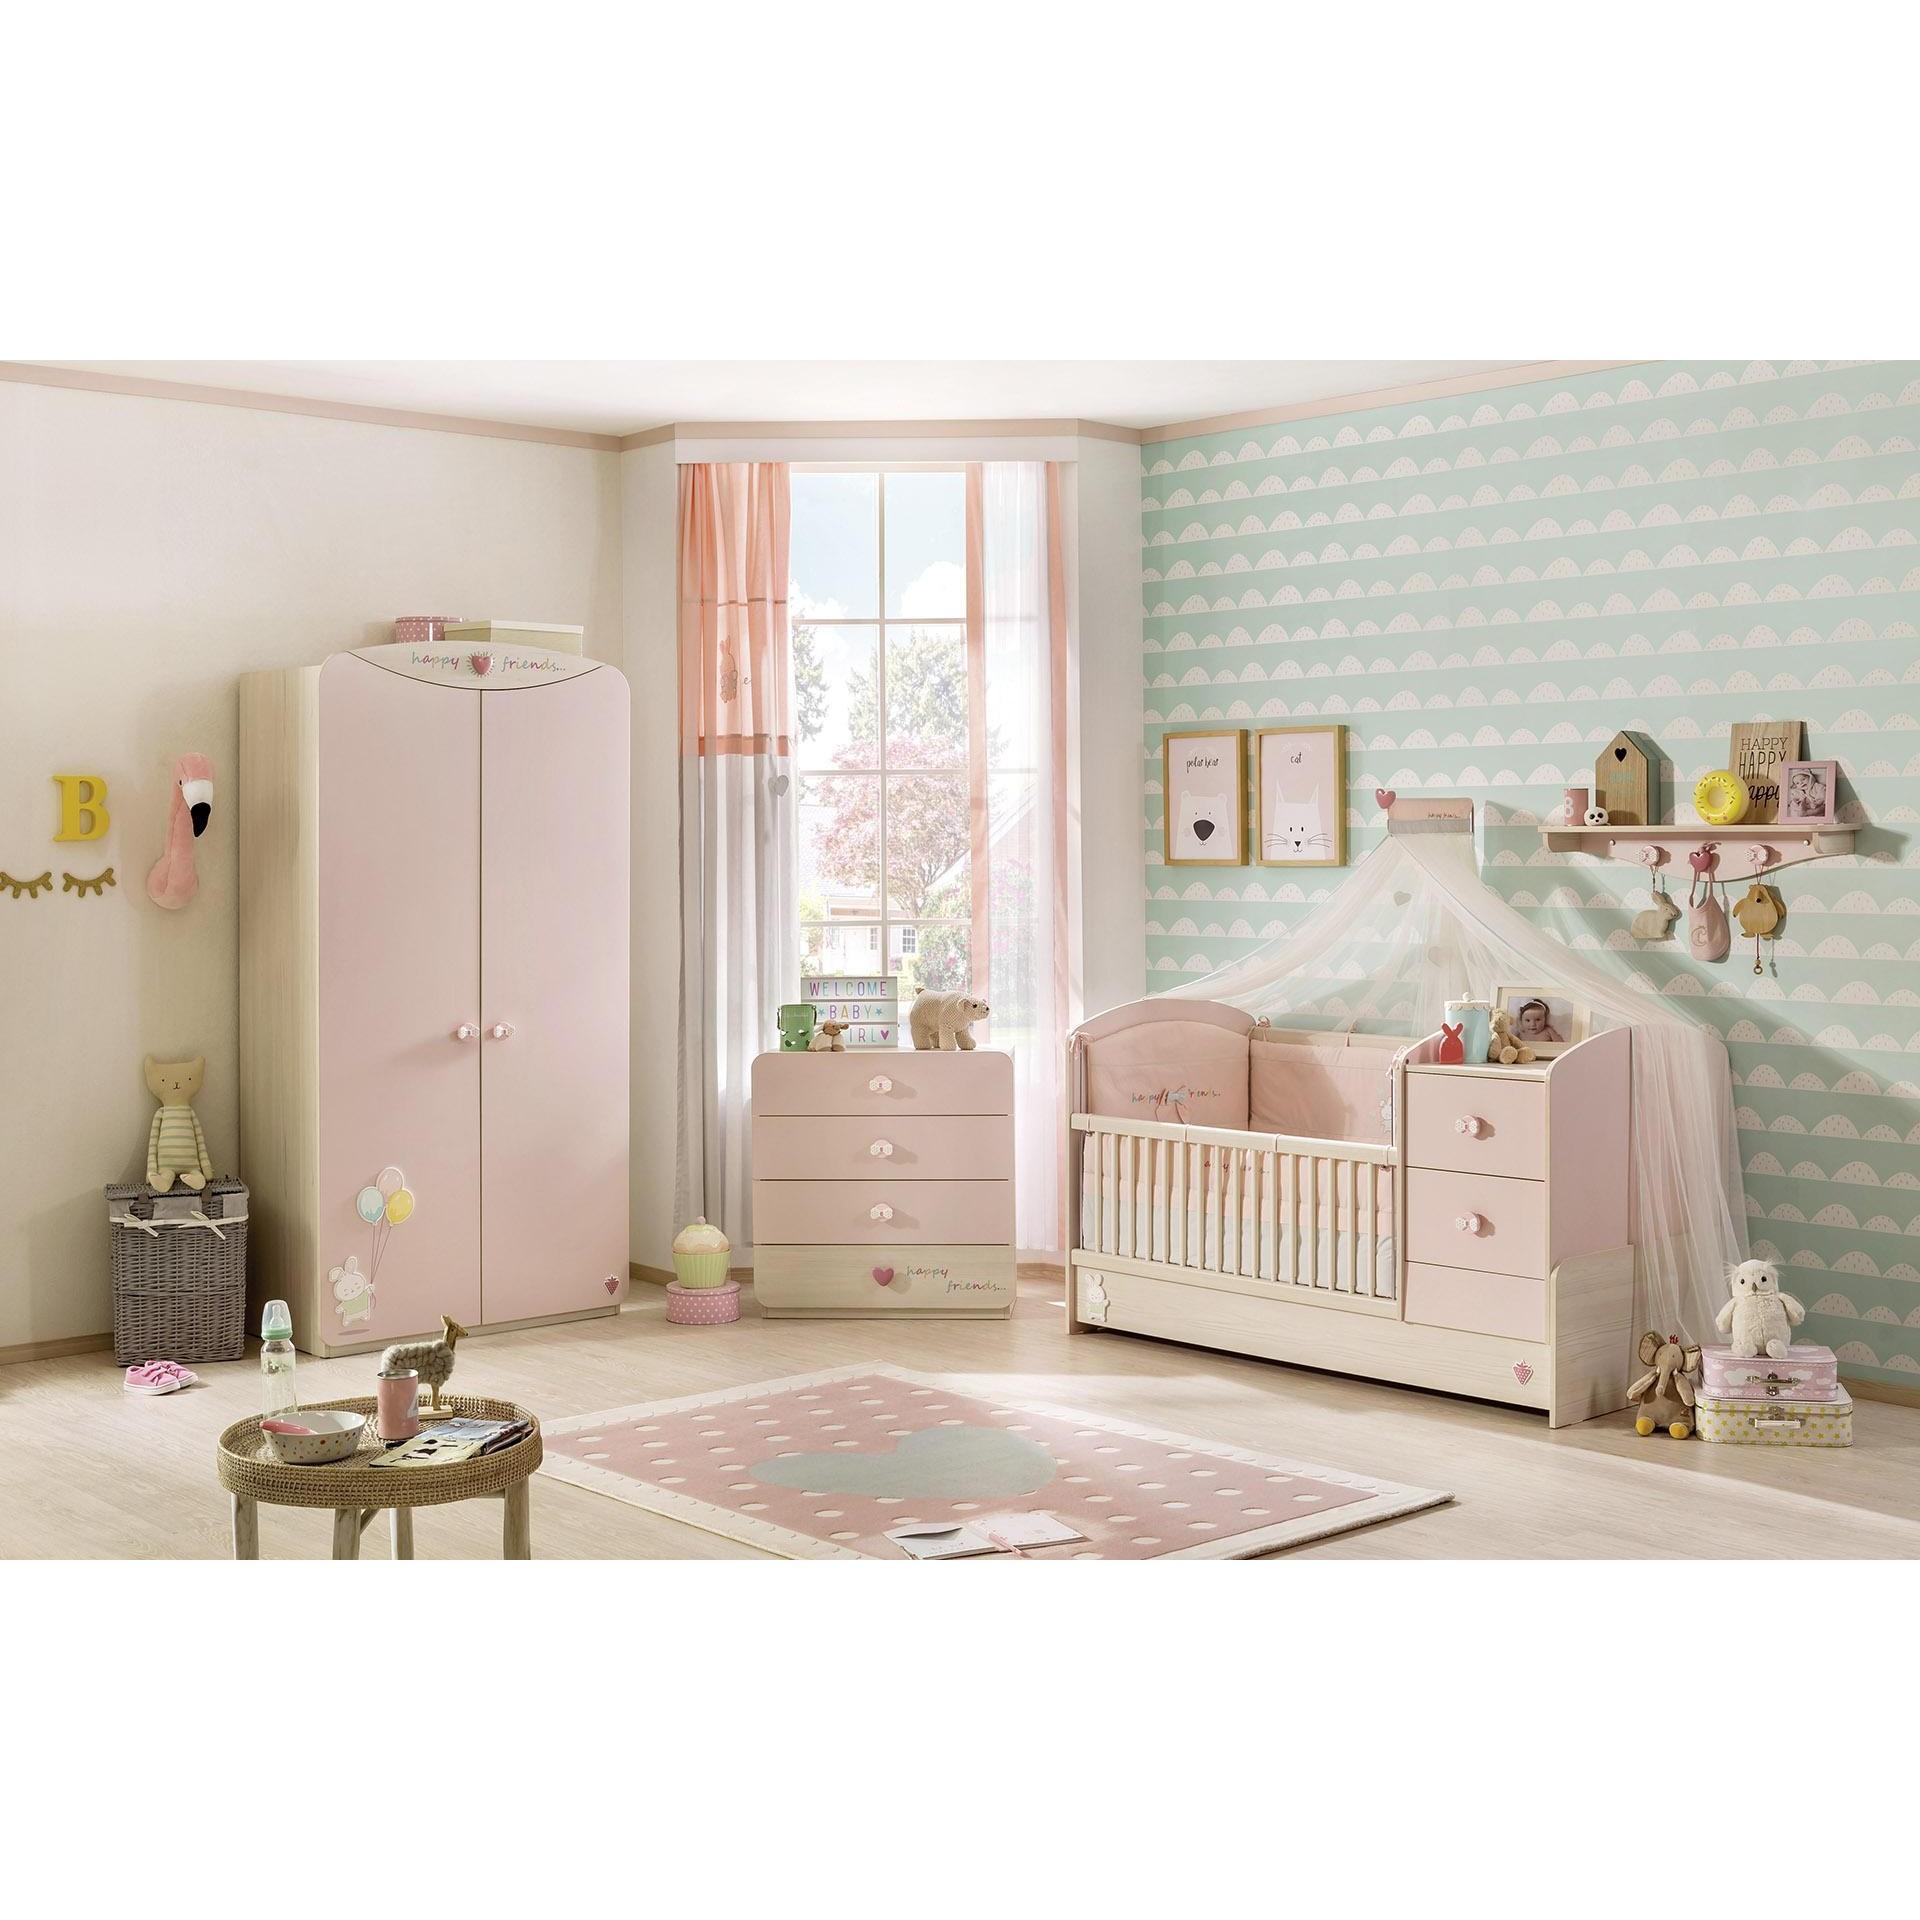 Baby Kamers Compleet.Babykamer Roze Babybed Ledikant Meegroeibed 4 In 1 Kinderkamer